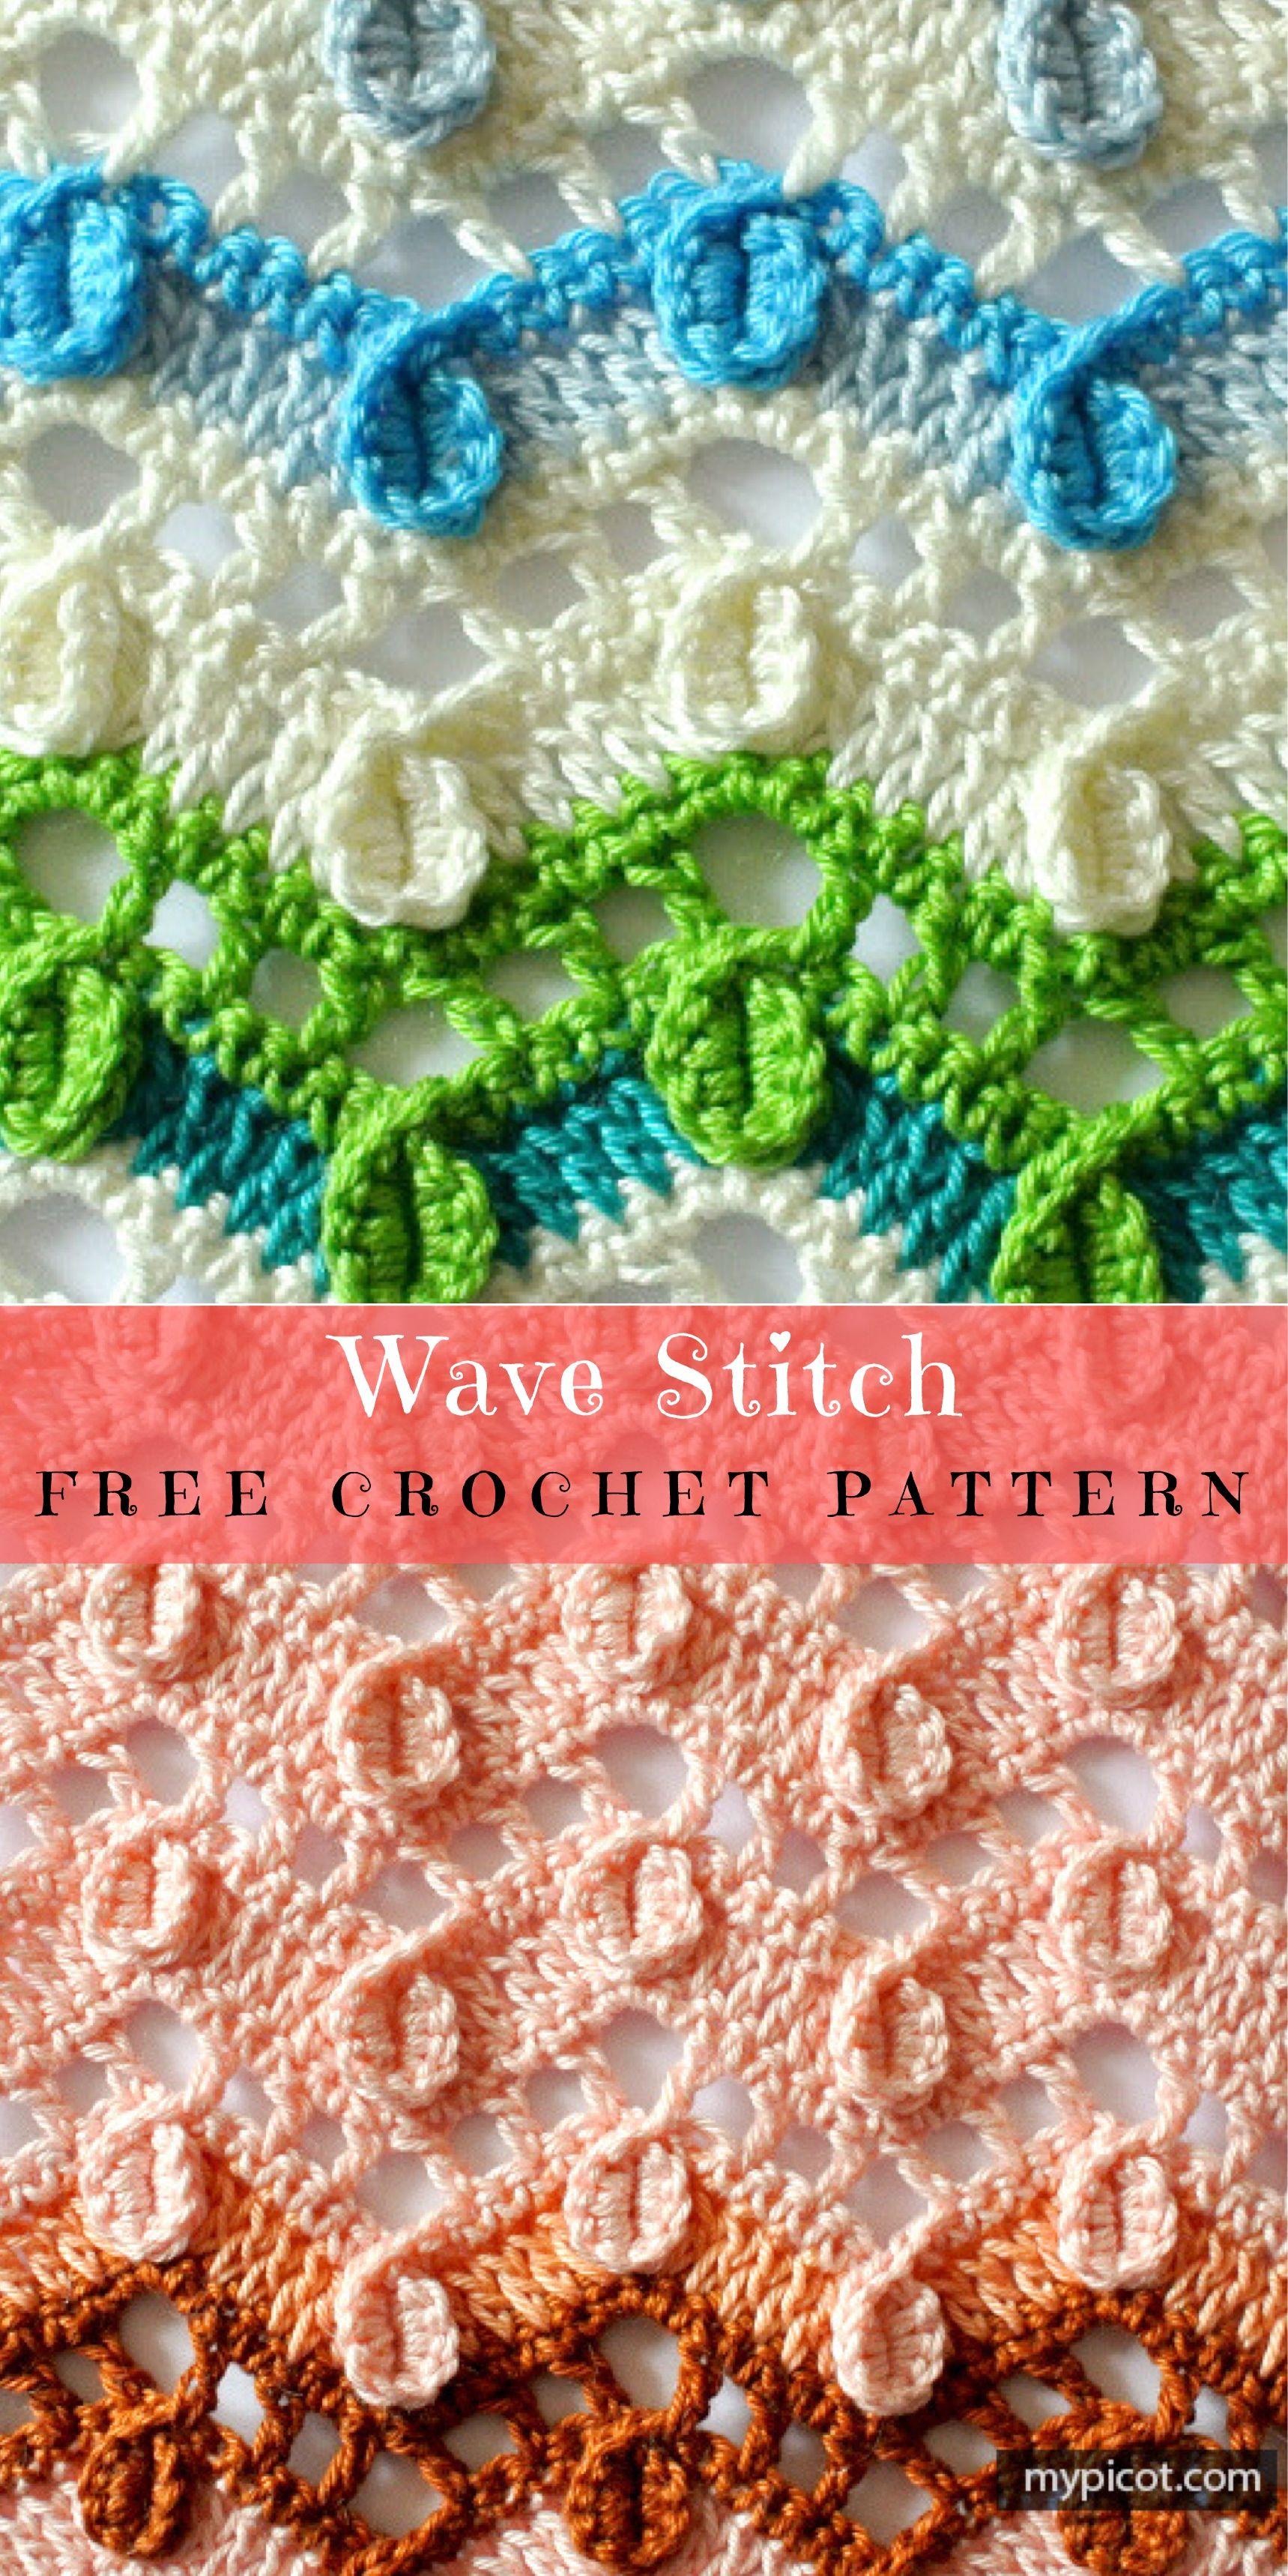 Wave Stitch Free Crochet Pattern | Free crochet, Yarns and Authors